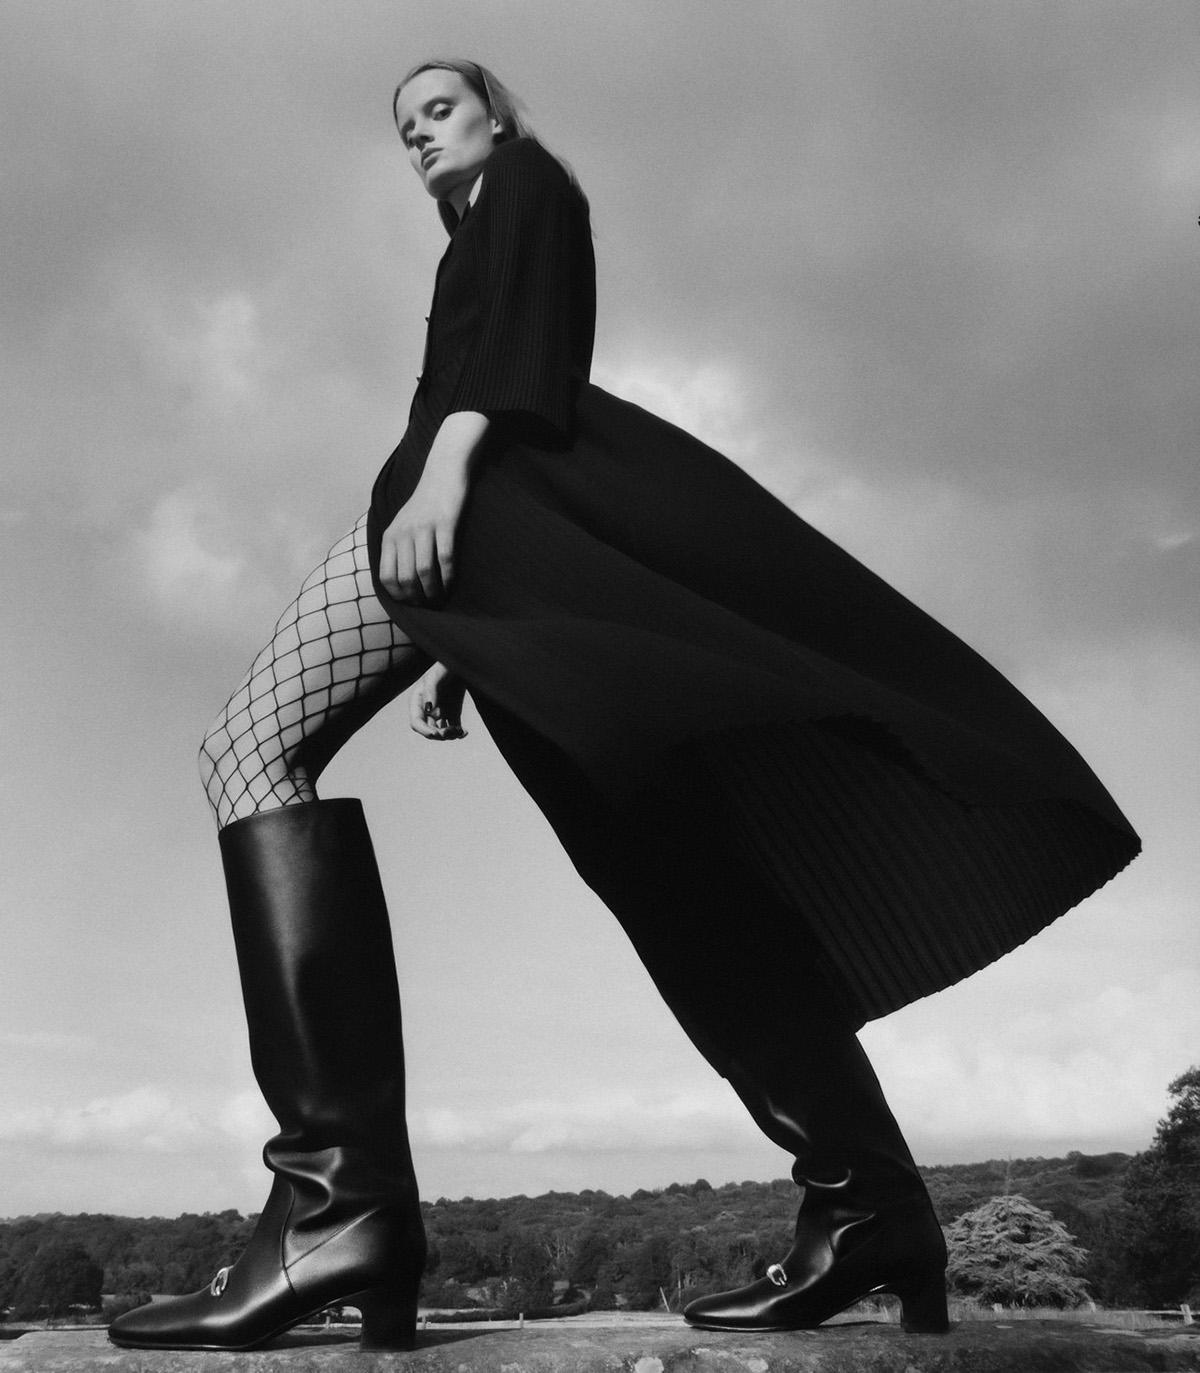 Evie Saunders by Samuel Bradley for WSJ. Magazine Fall 2021